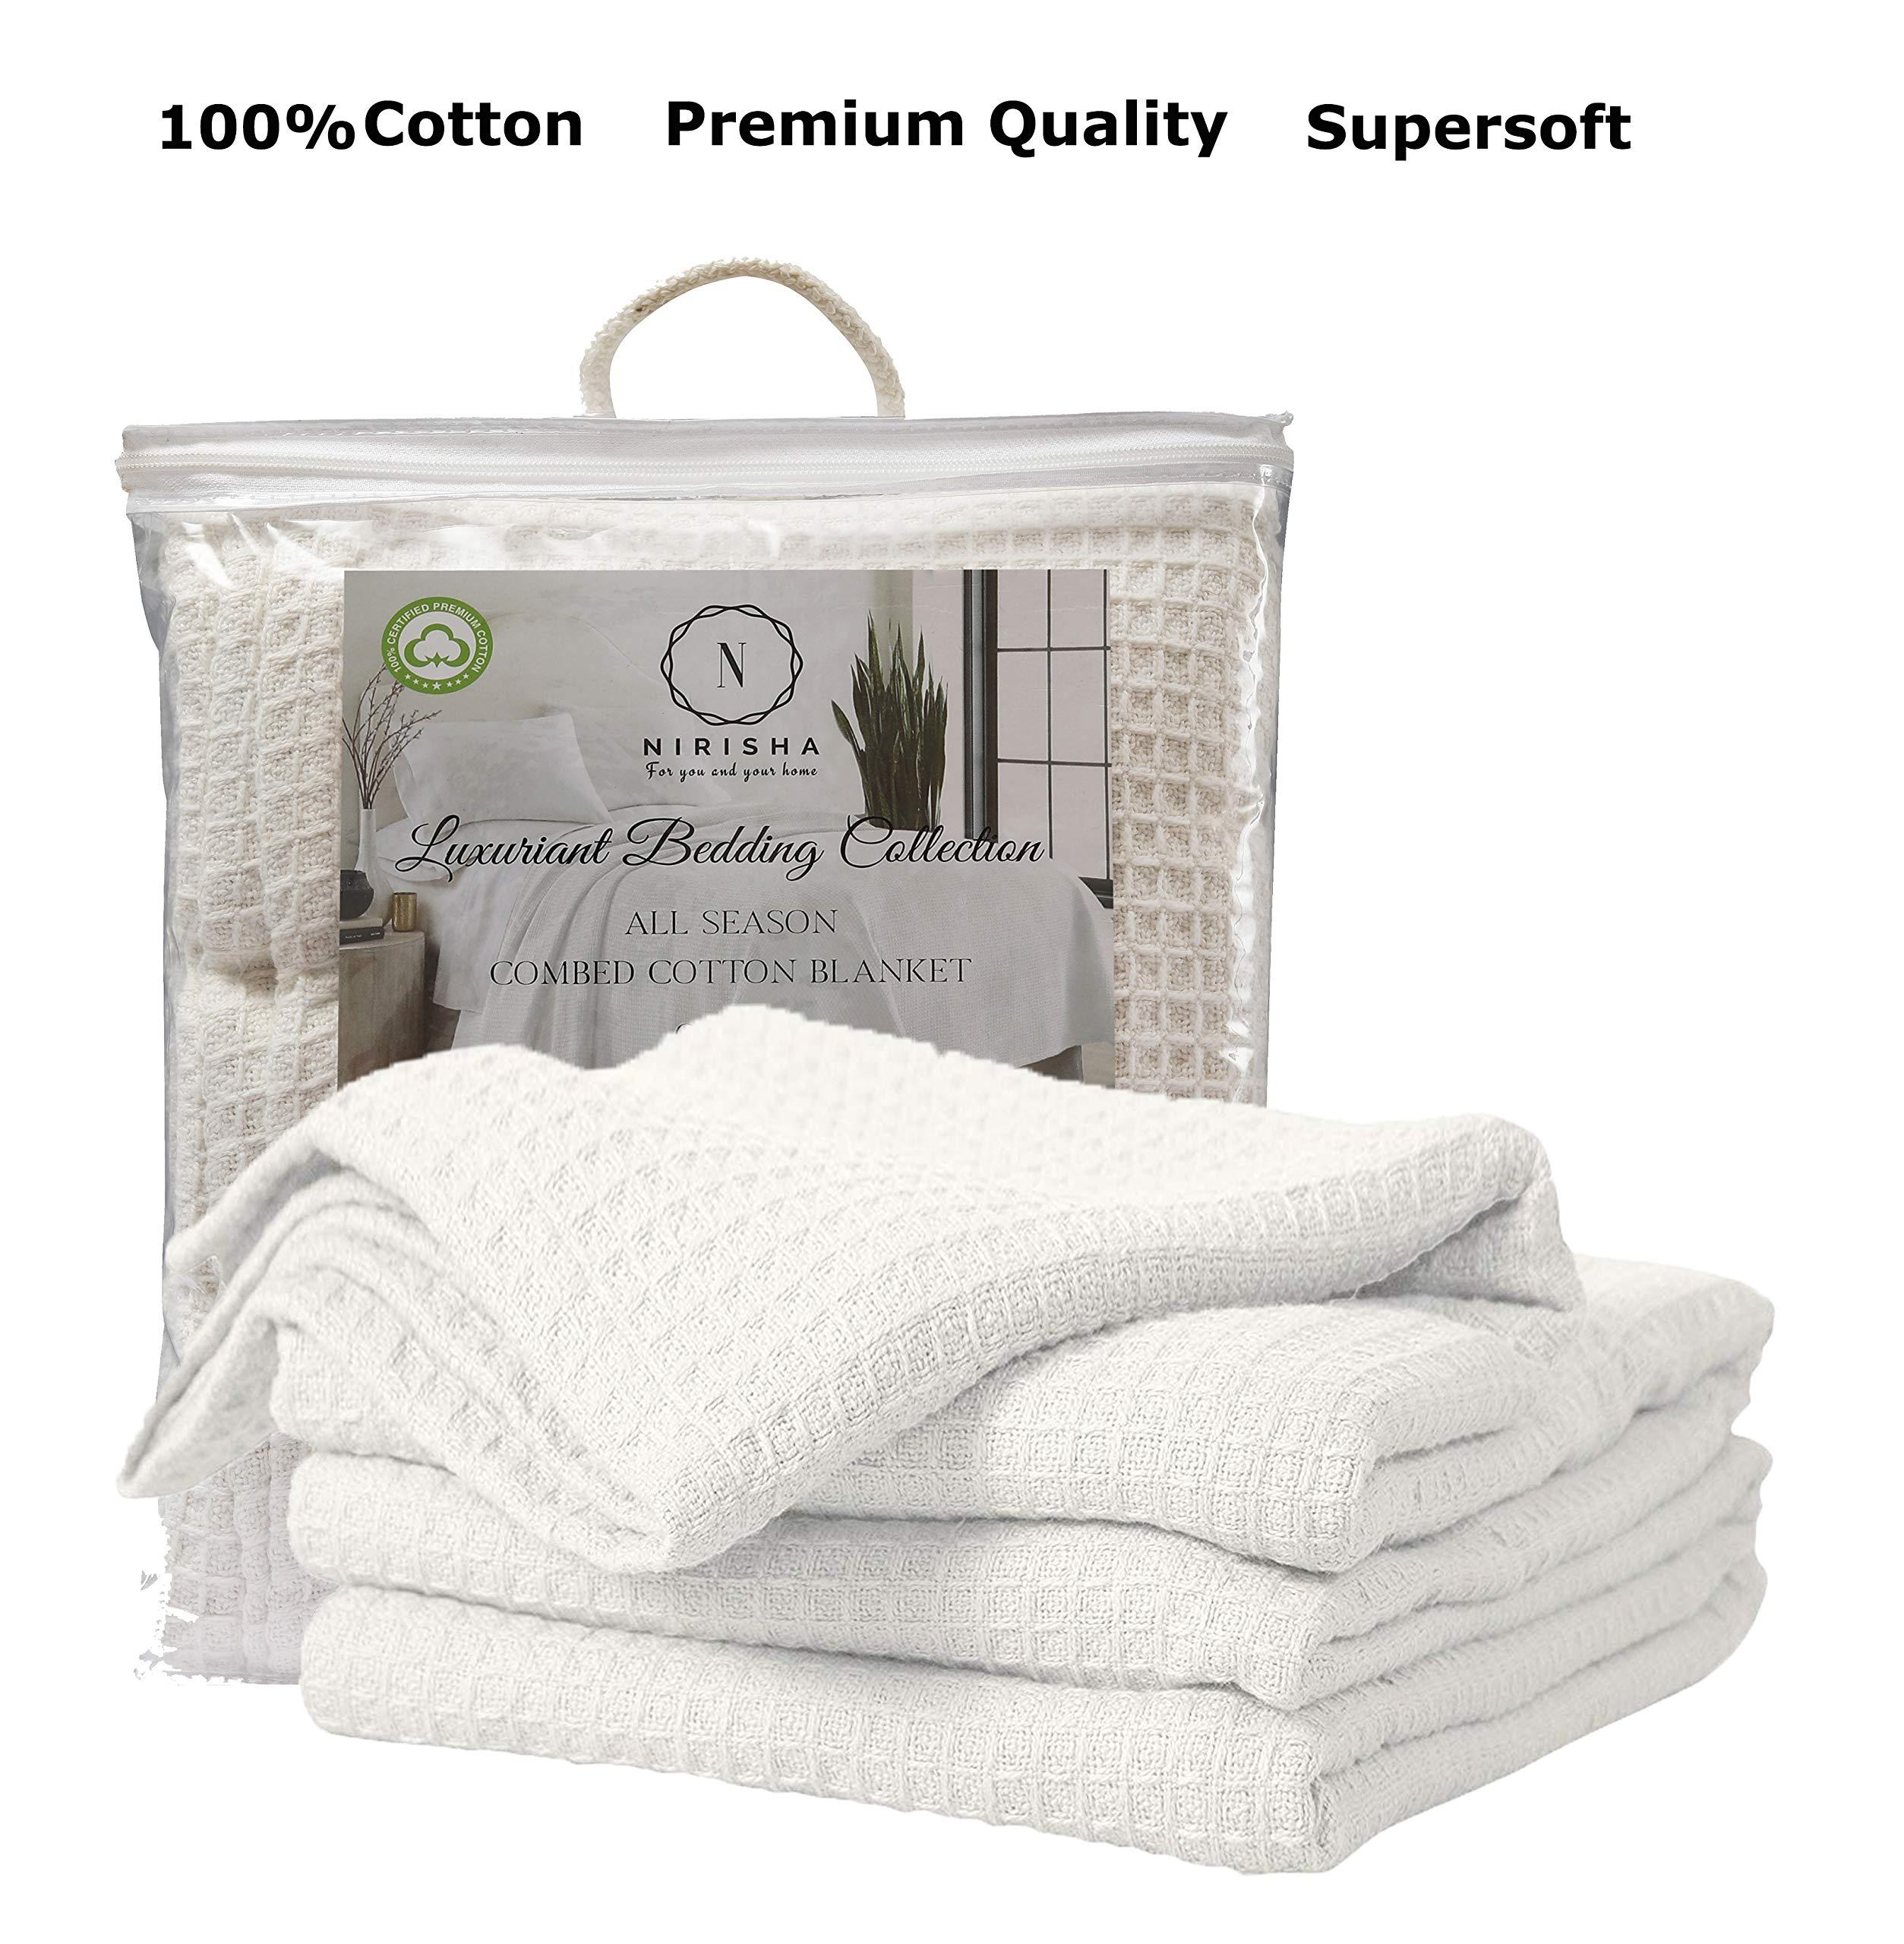 Nirisha Cotton Thermal Blanket– Waffle Weave – Queen Blanket – Lightweight Warm Soft & Cozy Cotton Blanket – Luxurious Breathable Blanket – Throw Blanket – All Season White Cotton Blanket